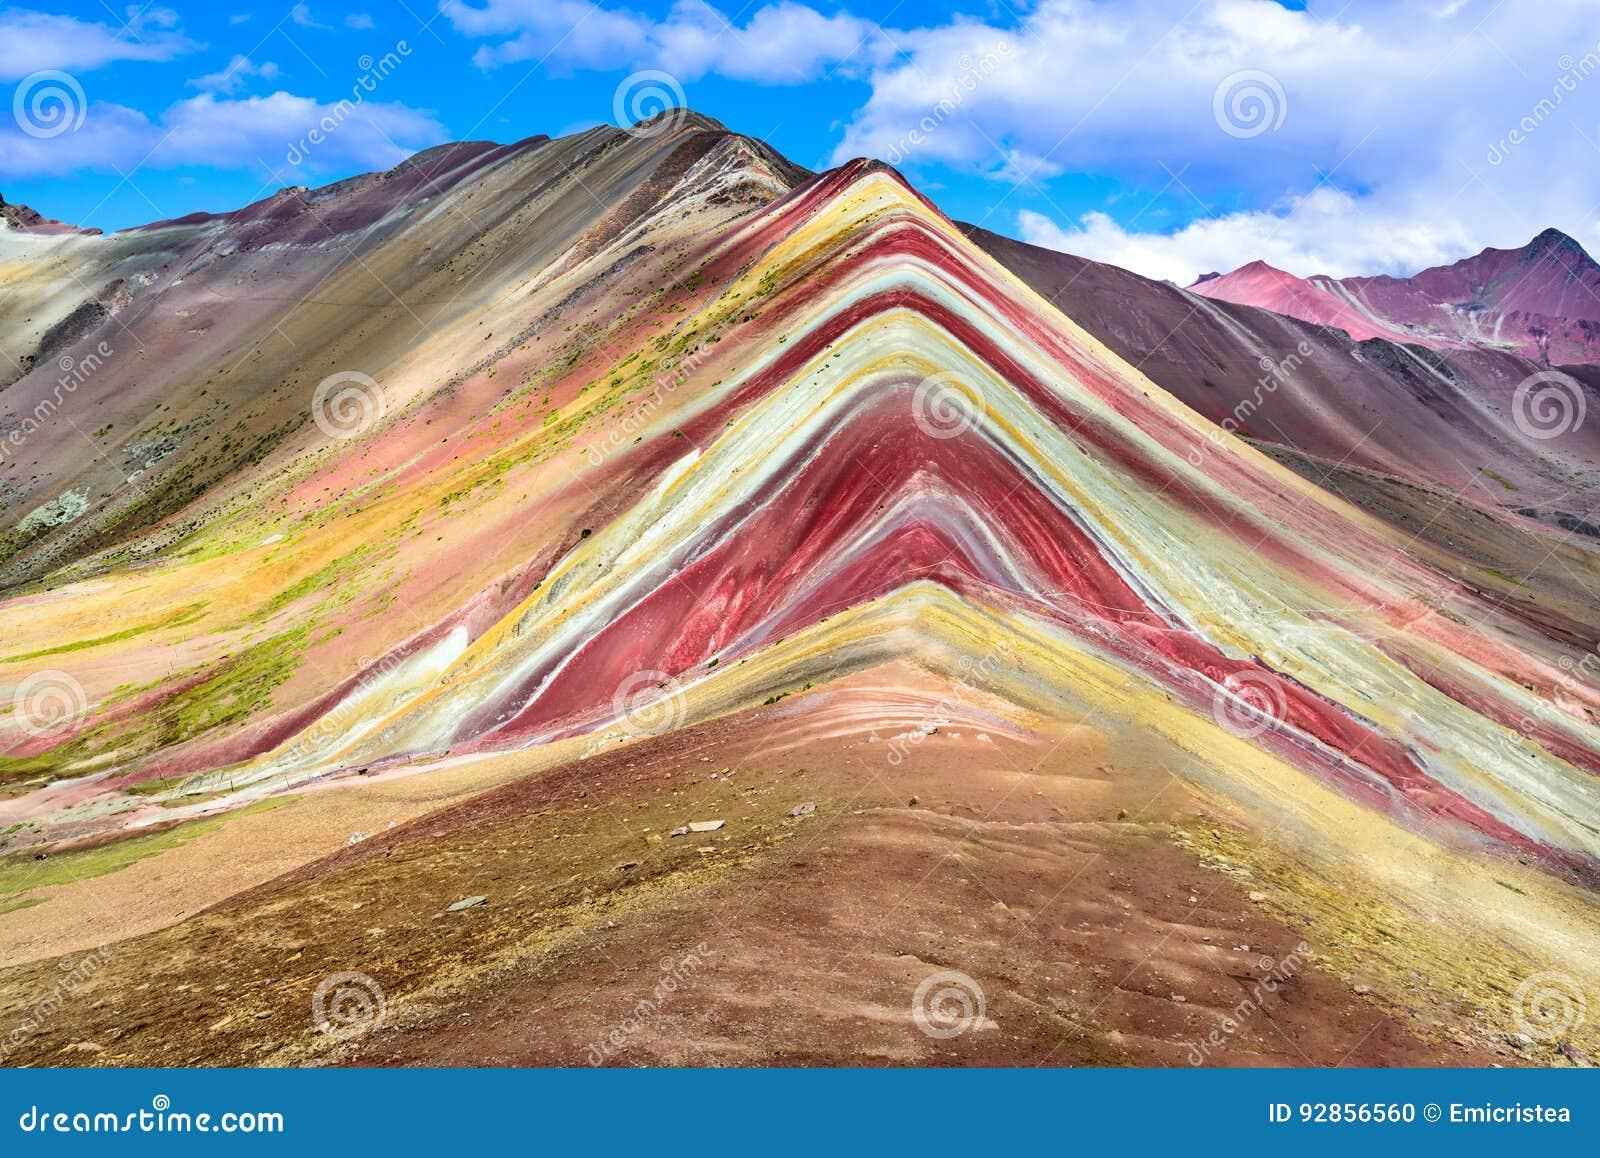 Vinicunca, Rainbow Mountain - Peru